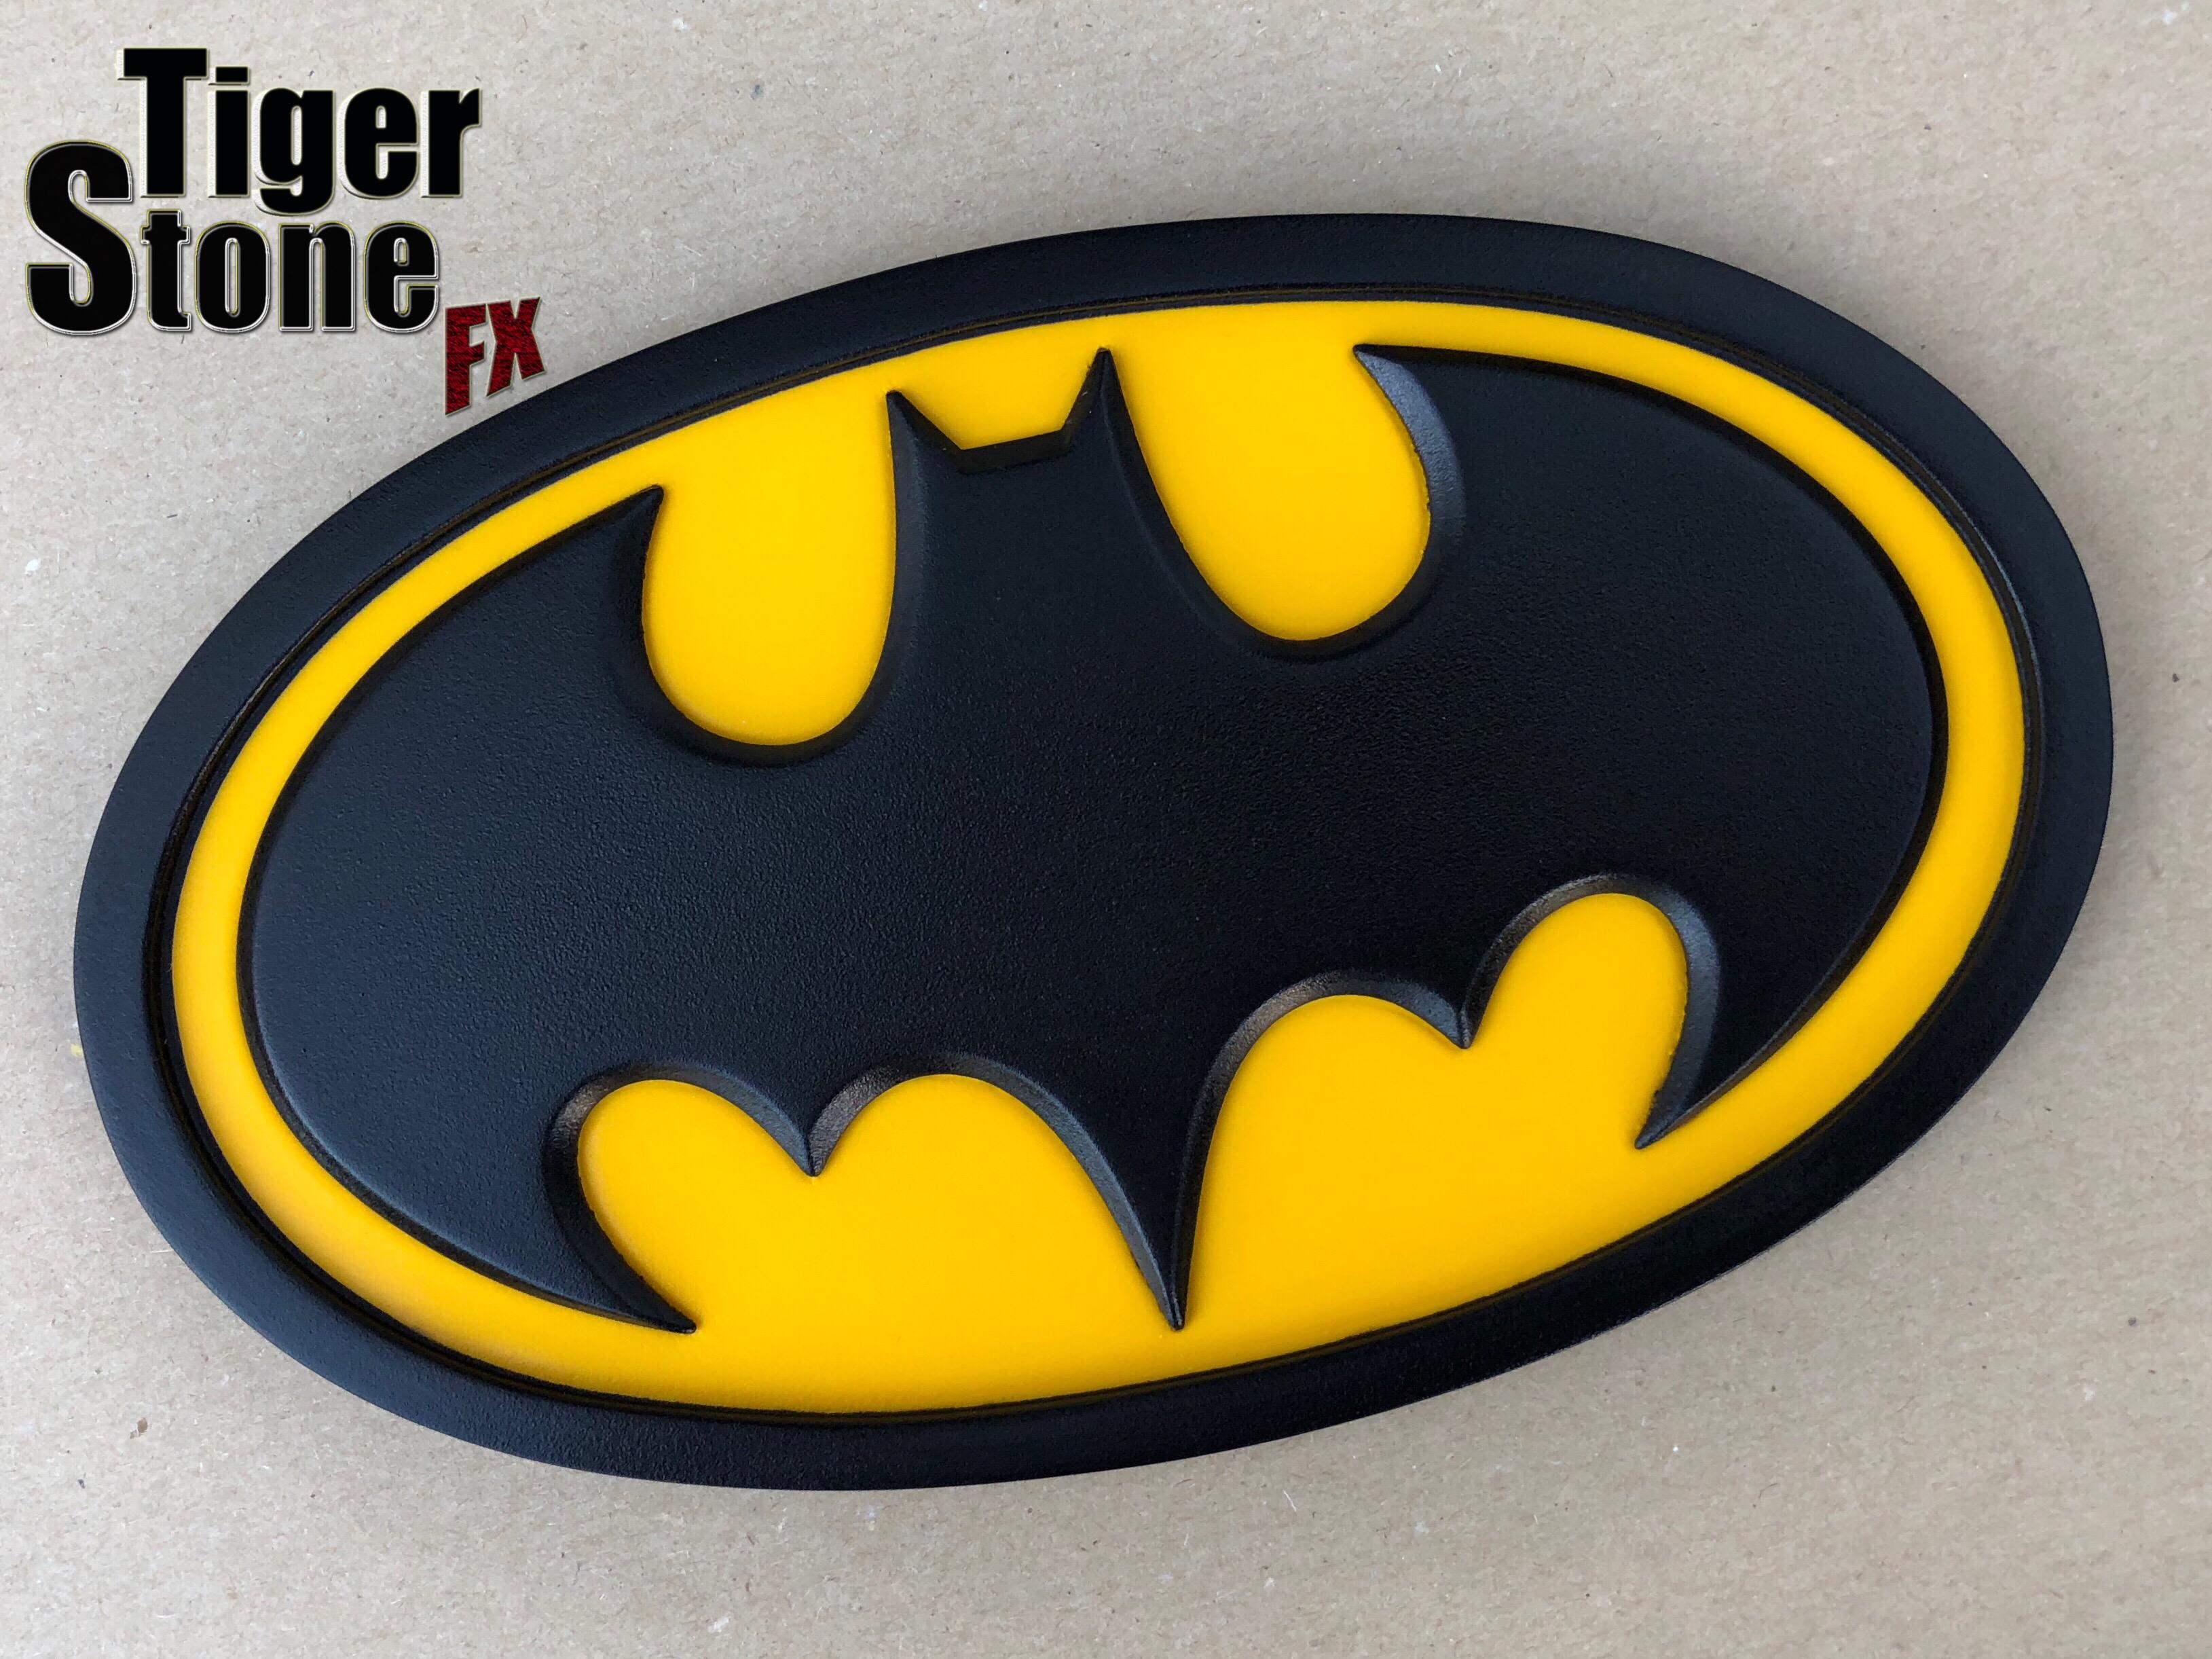 Batman classic oval emblem Batman The Animated Series chest emblem (blog photo) - by Tiger Stone FX